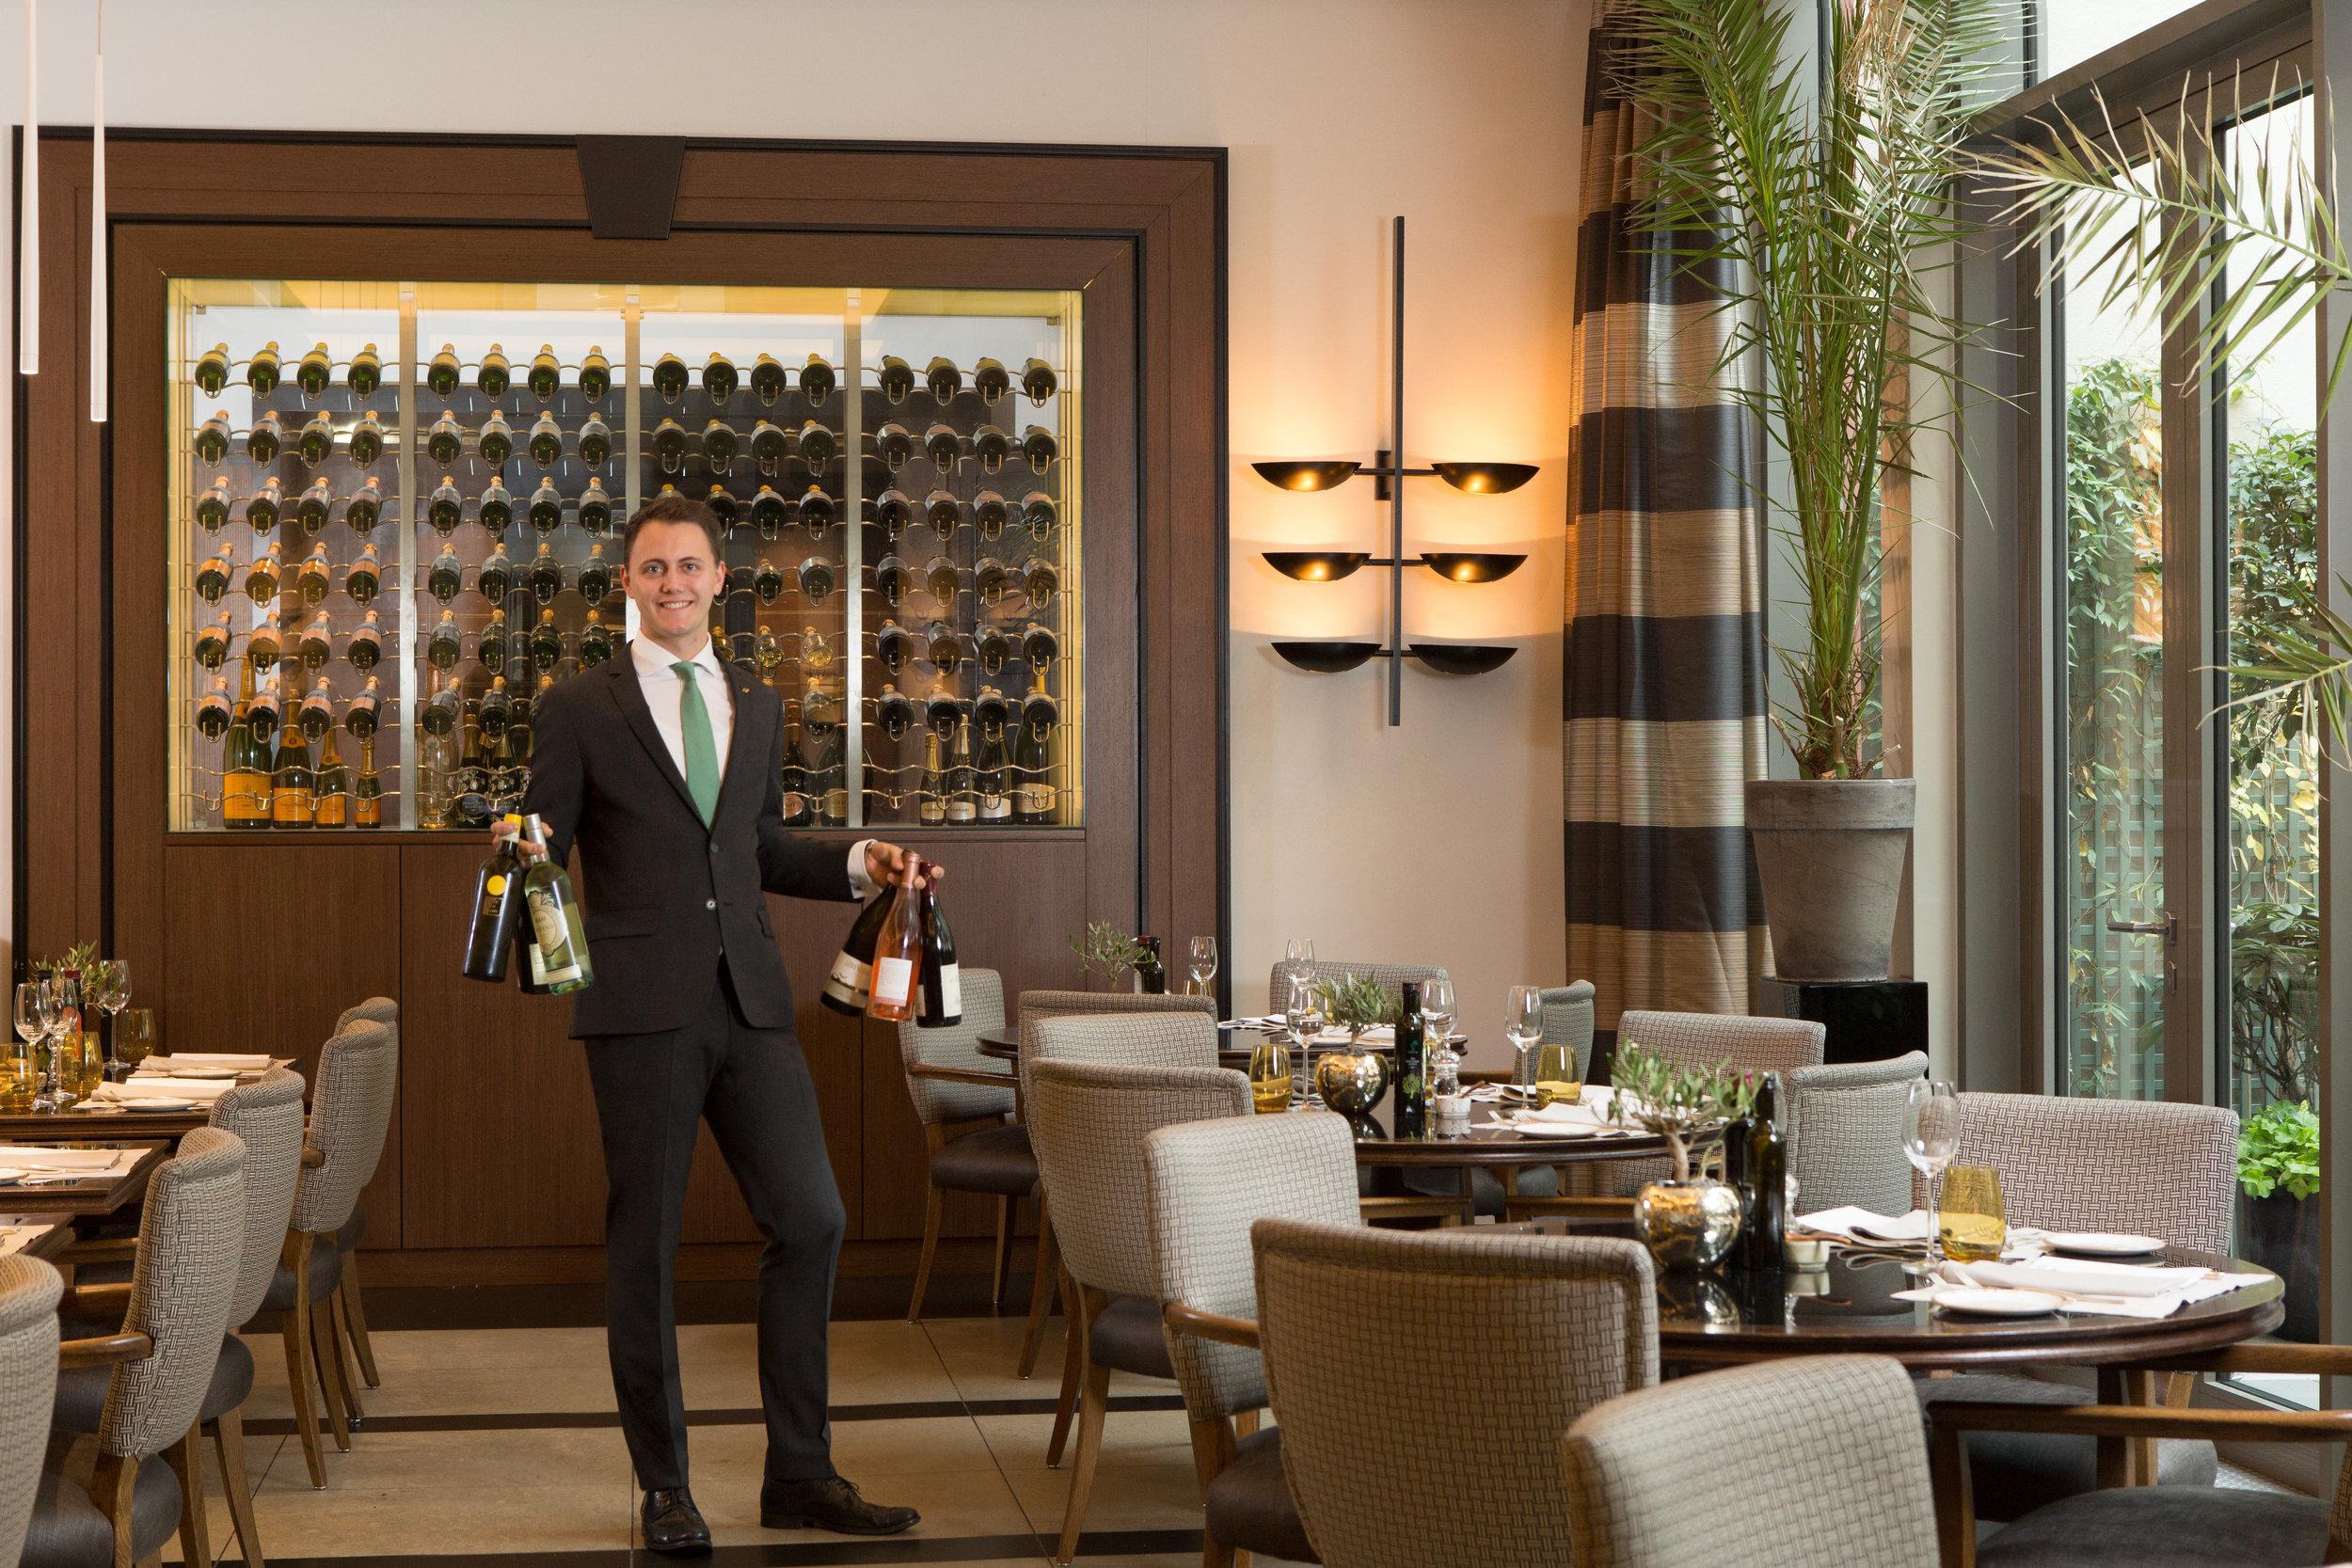 20 RFH Hotel de Rome - La Banca restaurant (2).jpg